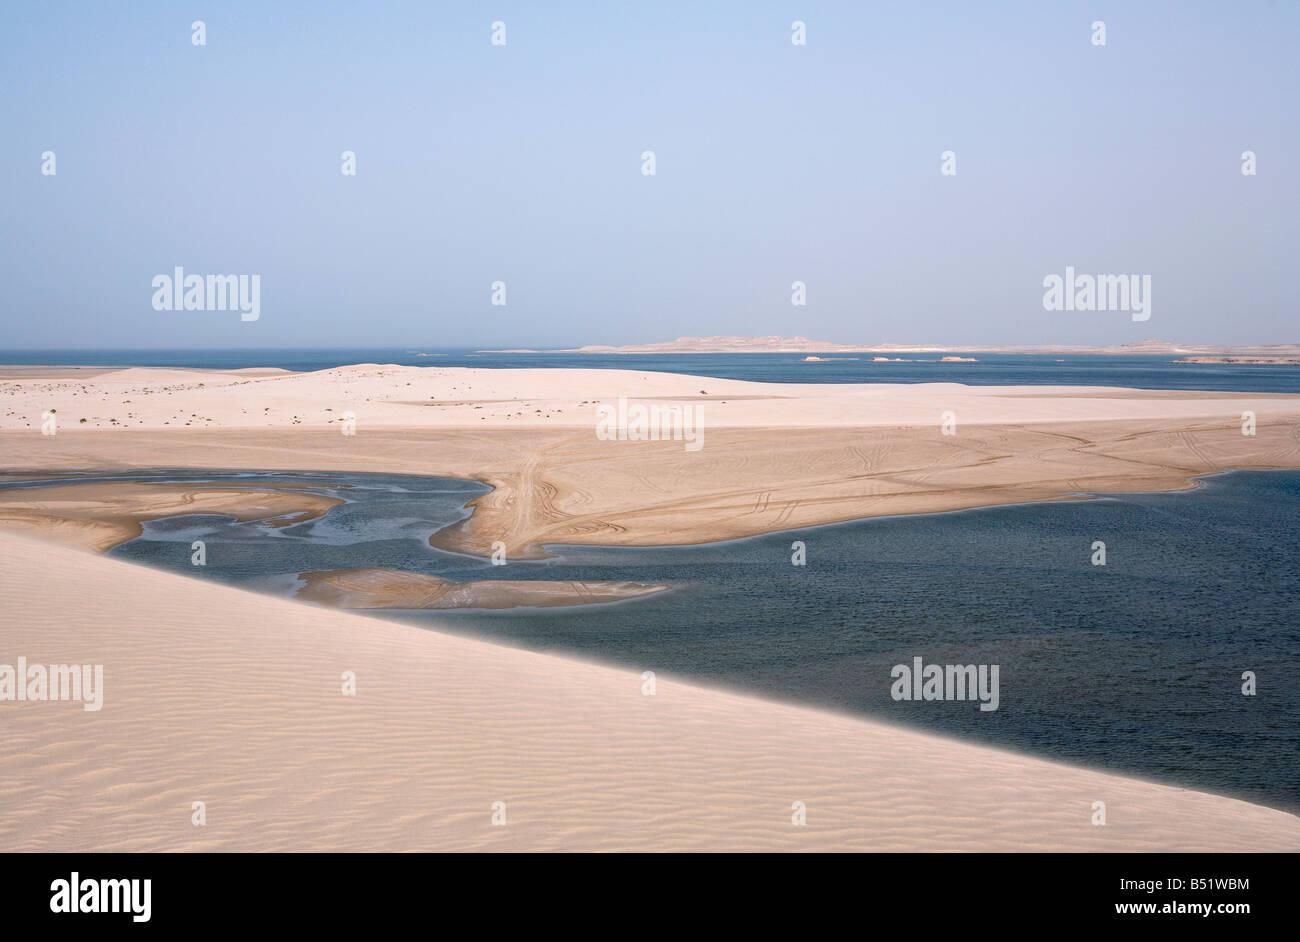 Qatar Inland sea near UAE border - Stock Image